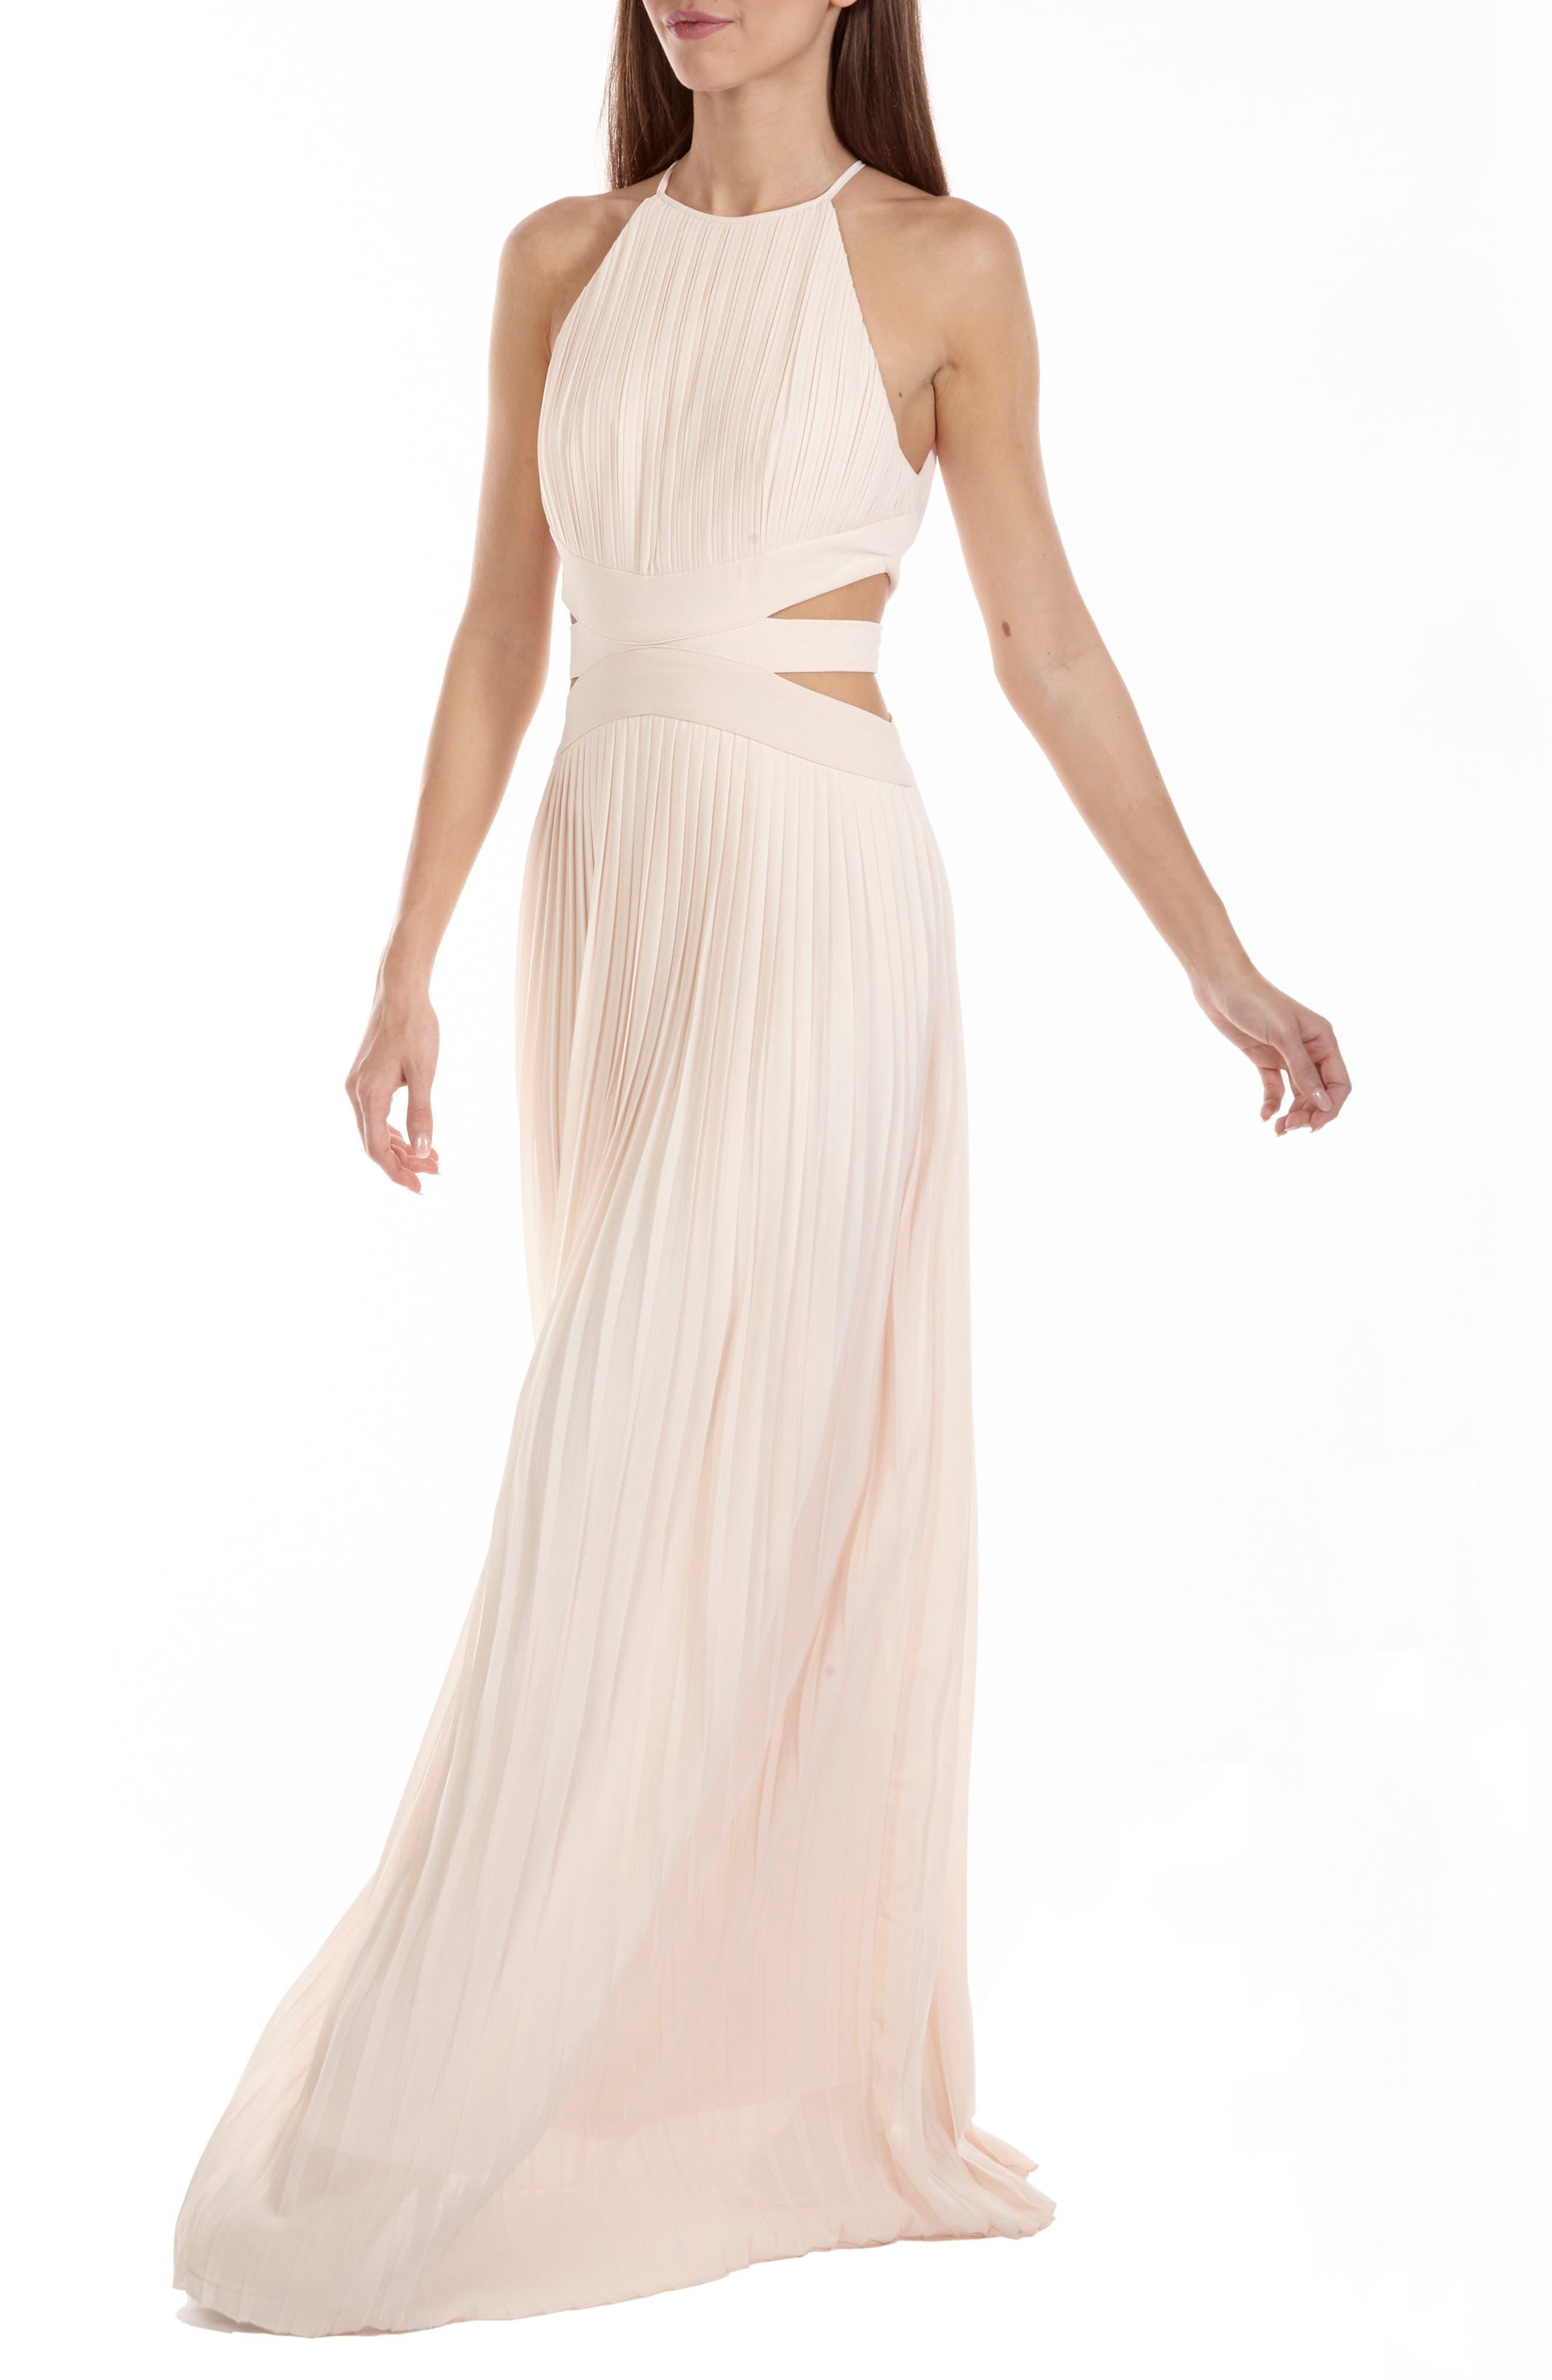 Boston Cutout Maxi Dress,                             Alternate thumbnail 3, color,                             Nude